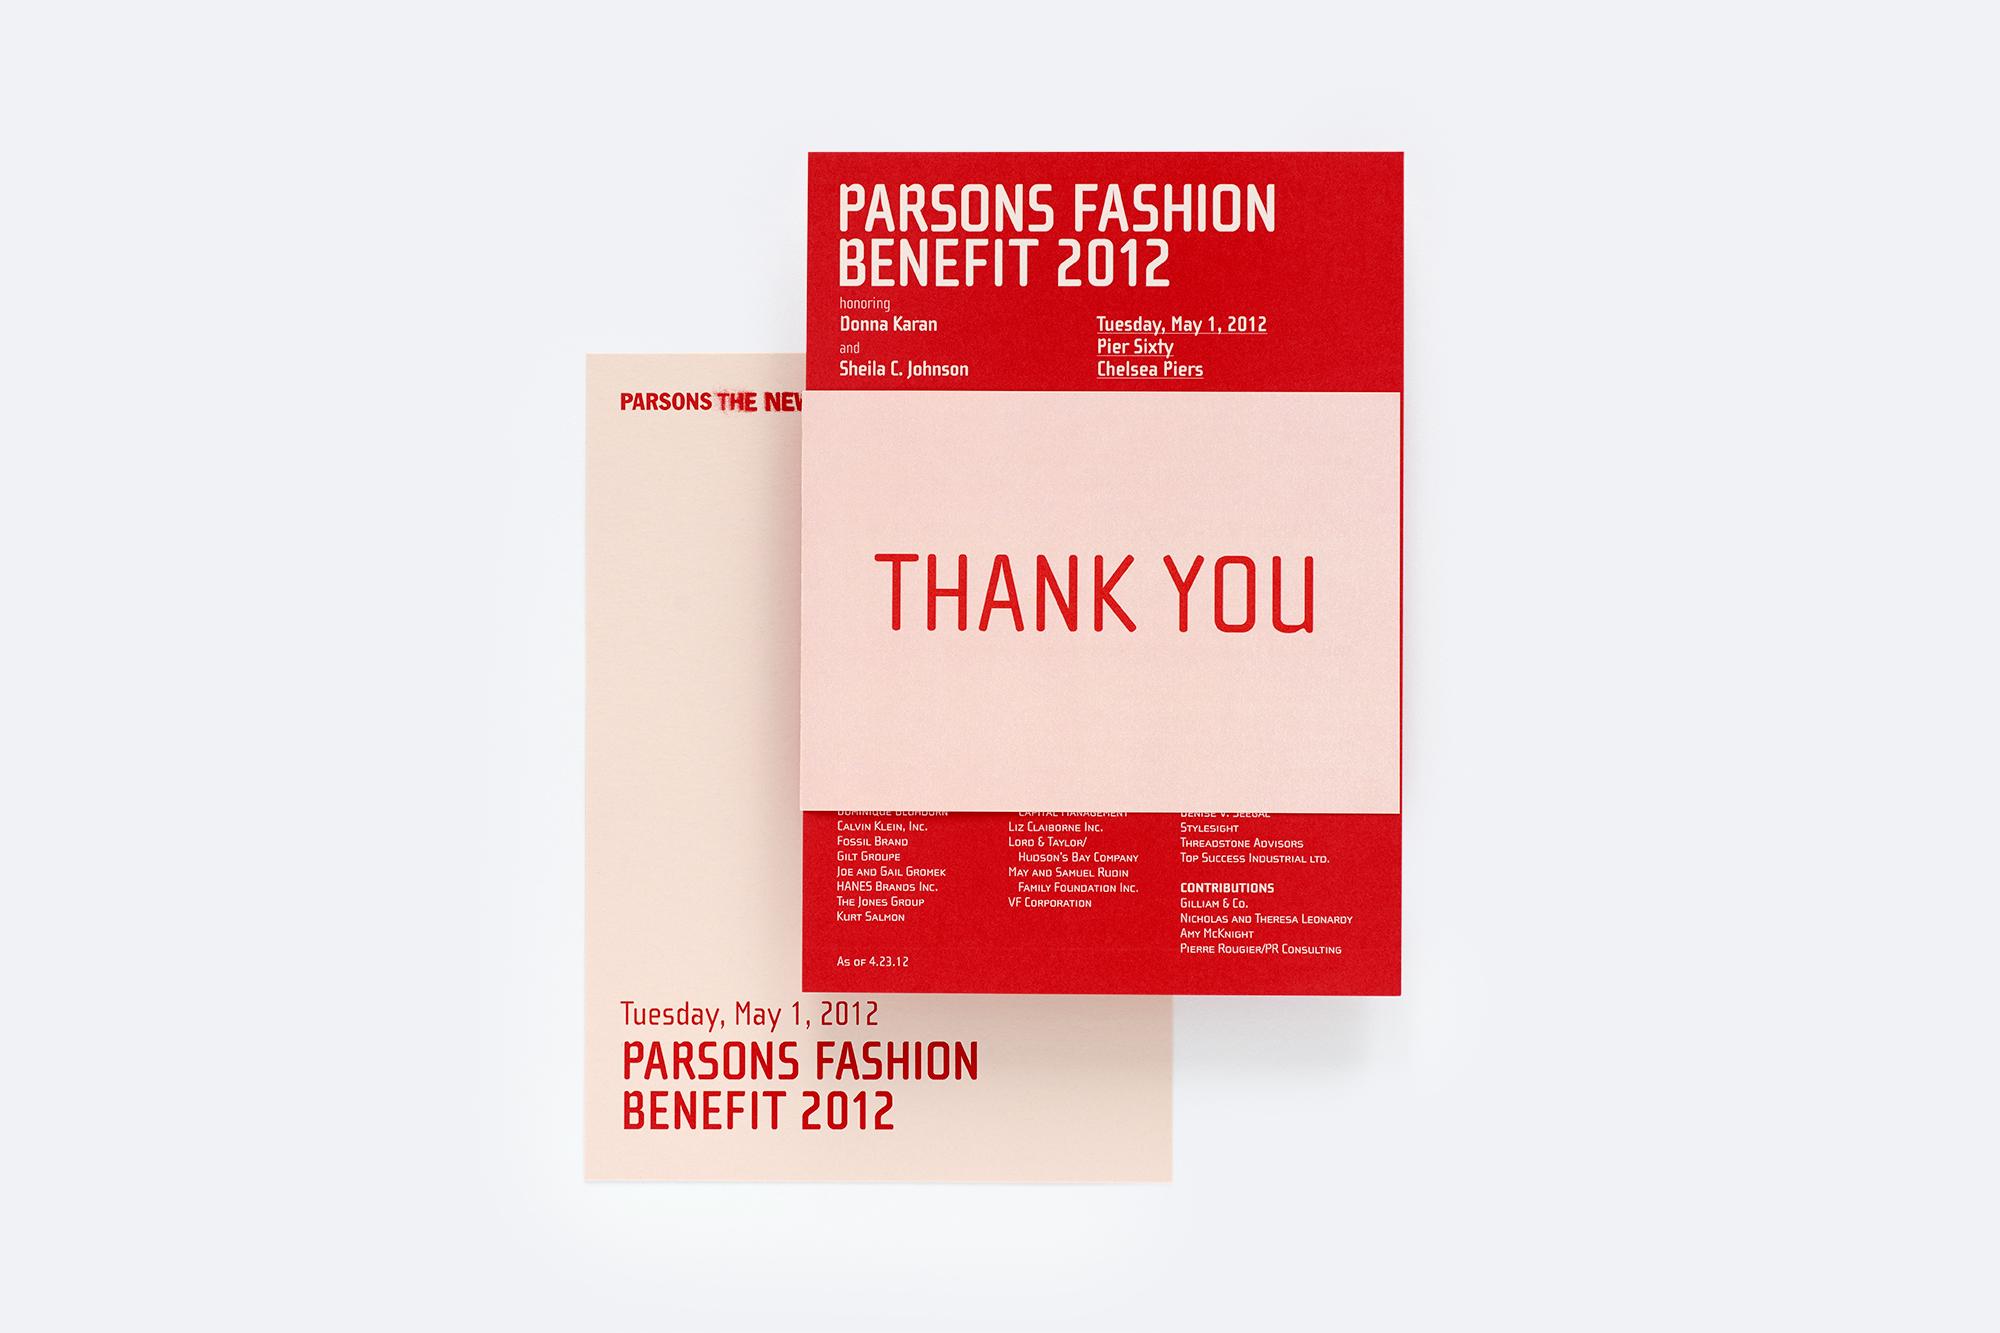 Thumbnail_Paula_Giraldo_Parsons_Fashion_Benefit_28.jpg